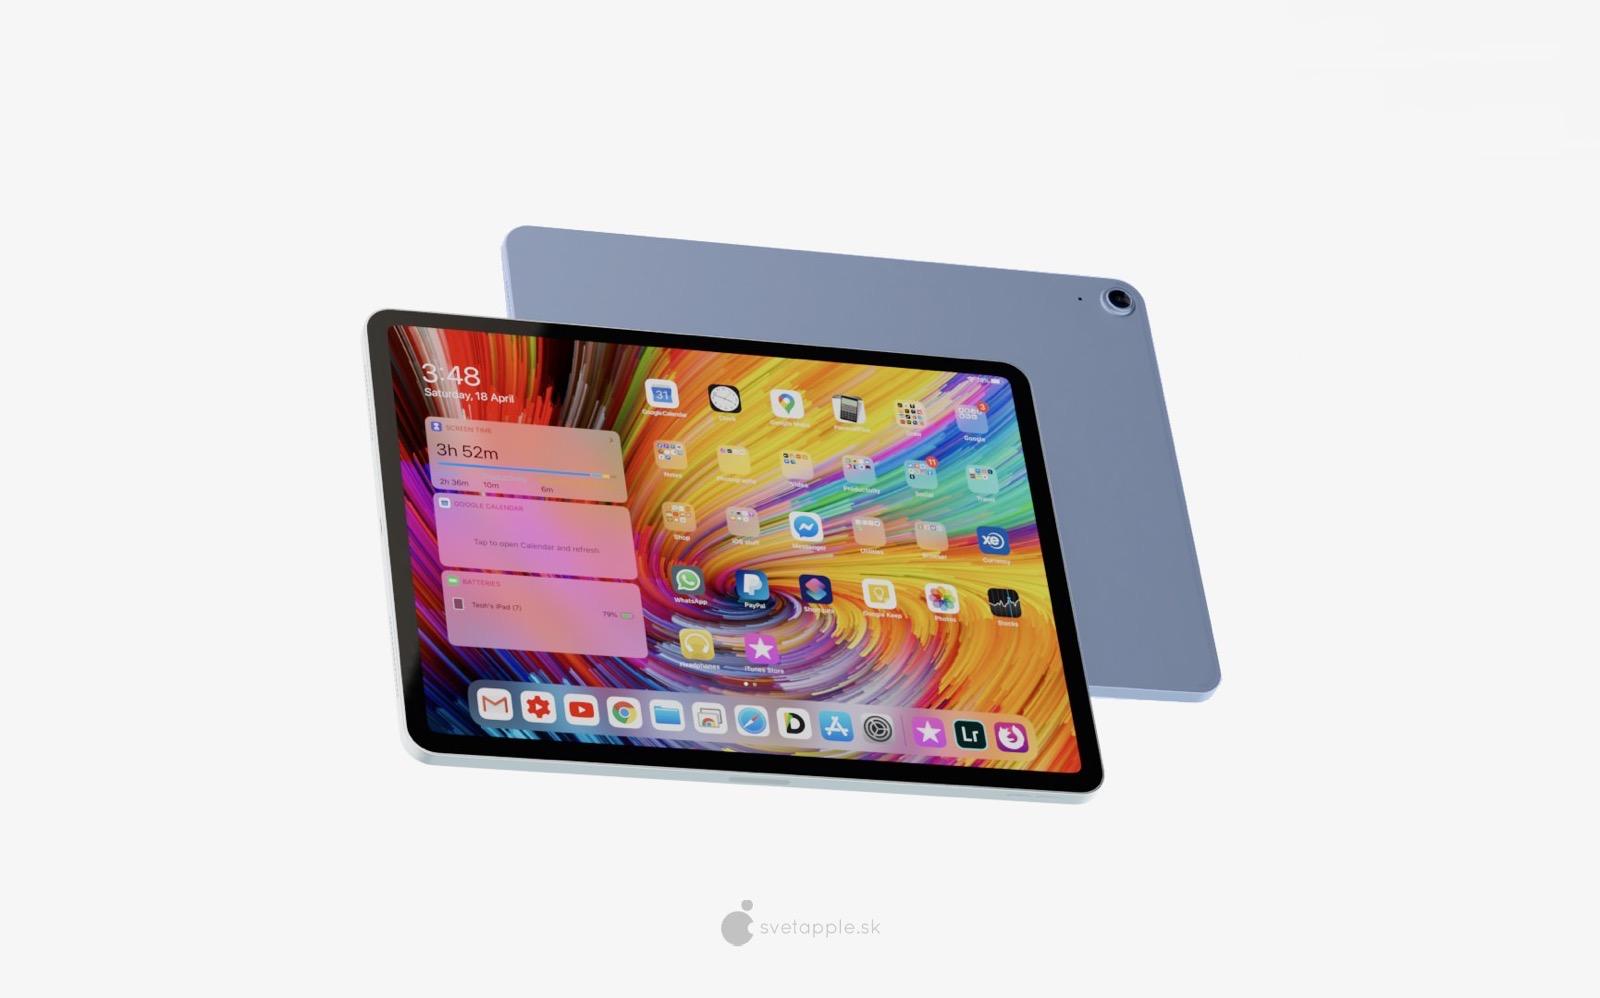 Ipad mini 6 concept image